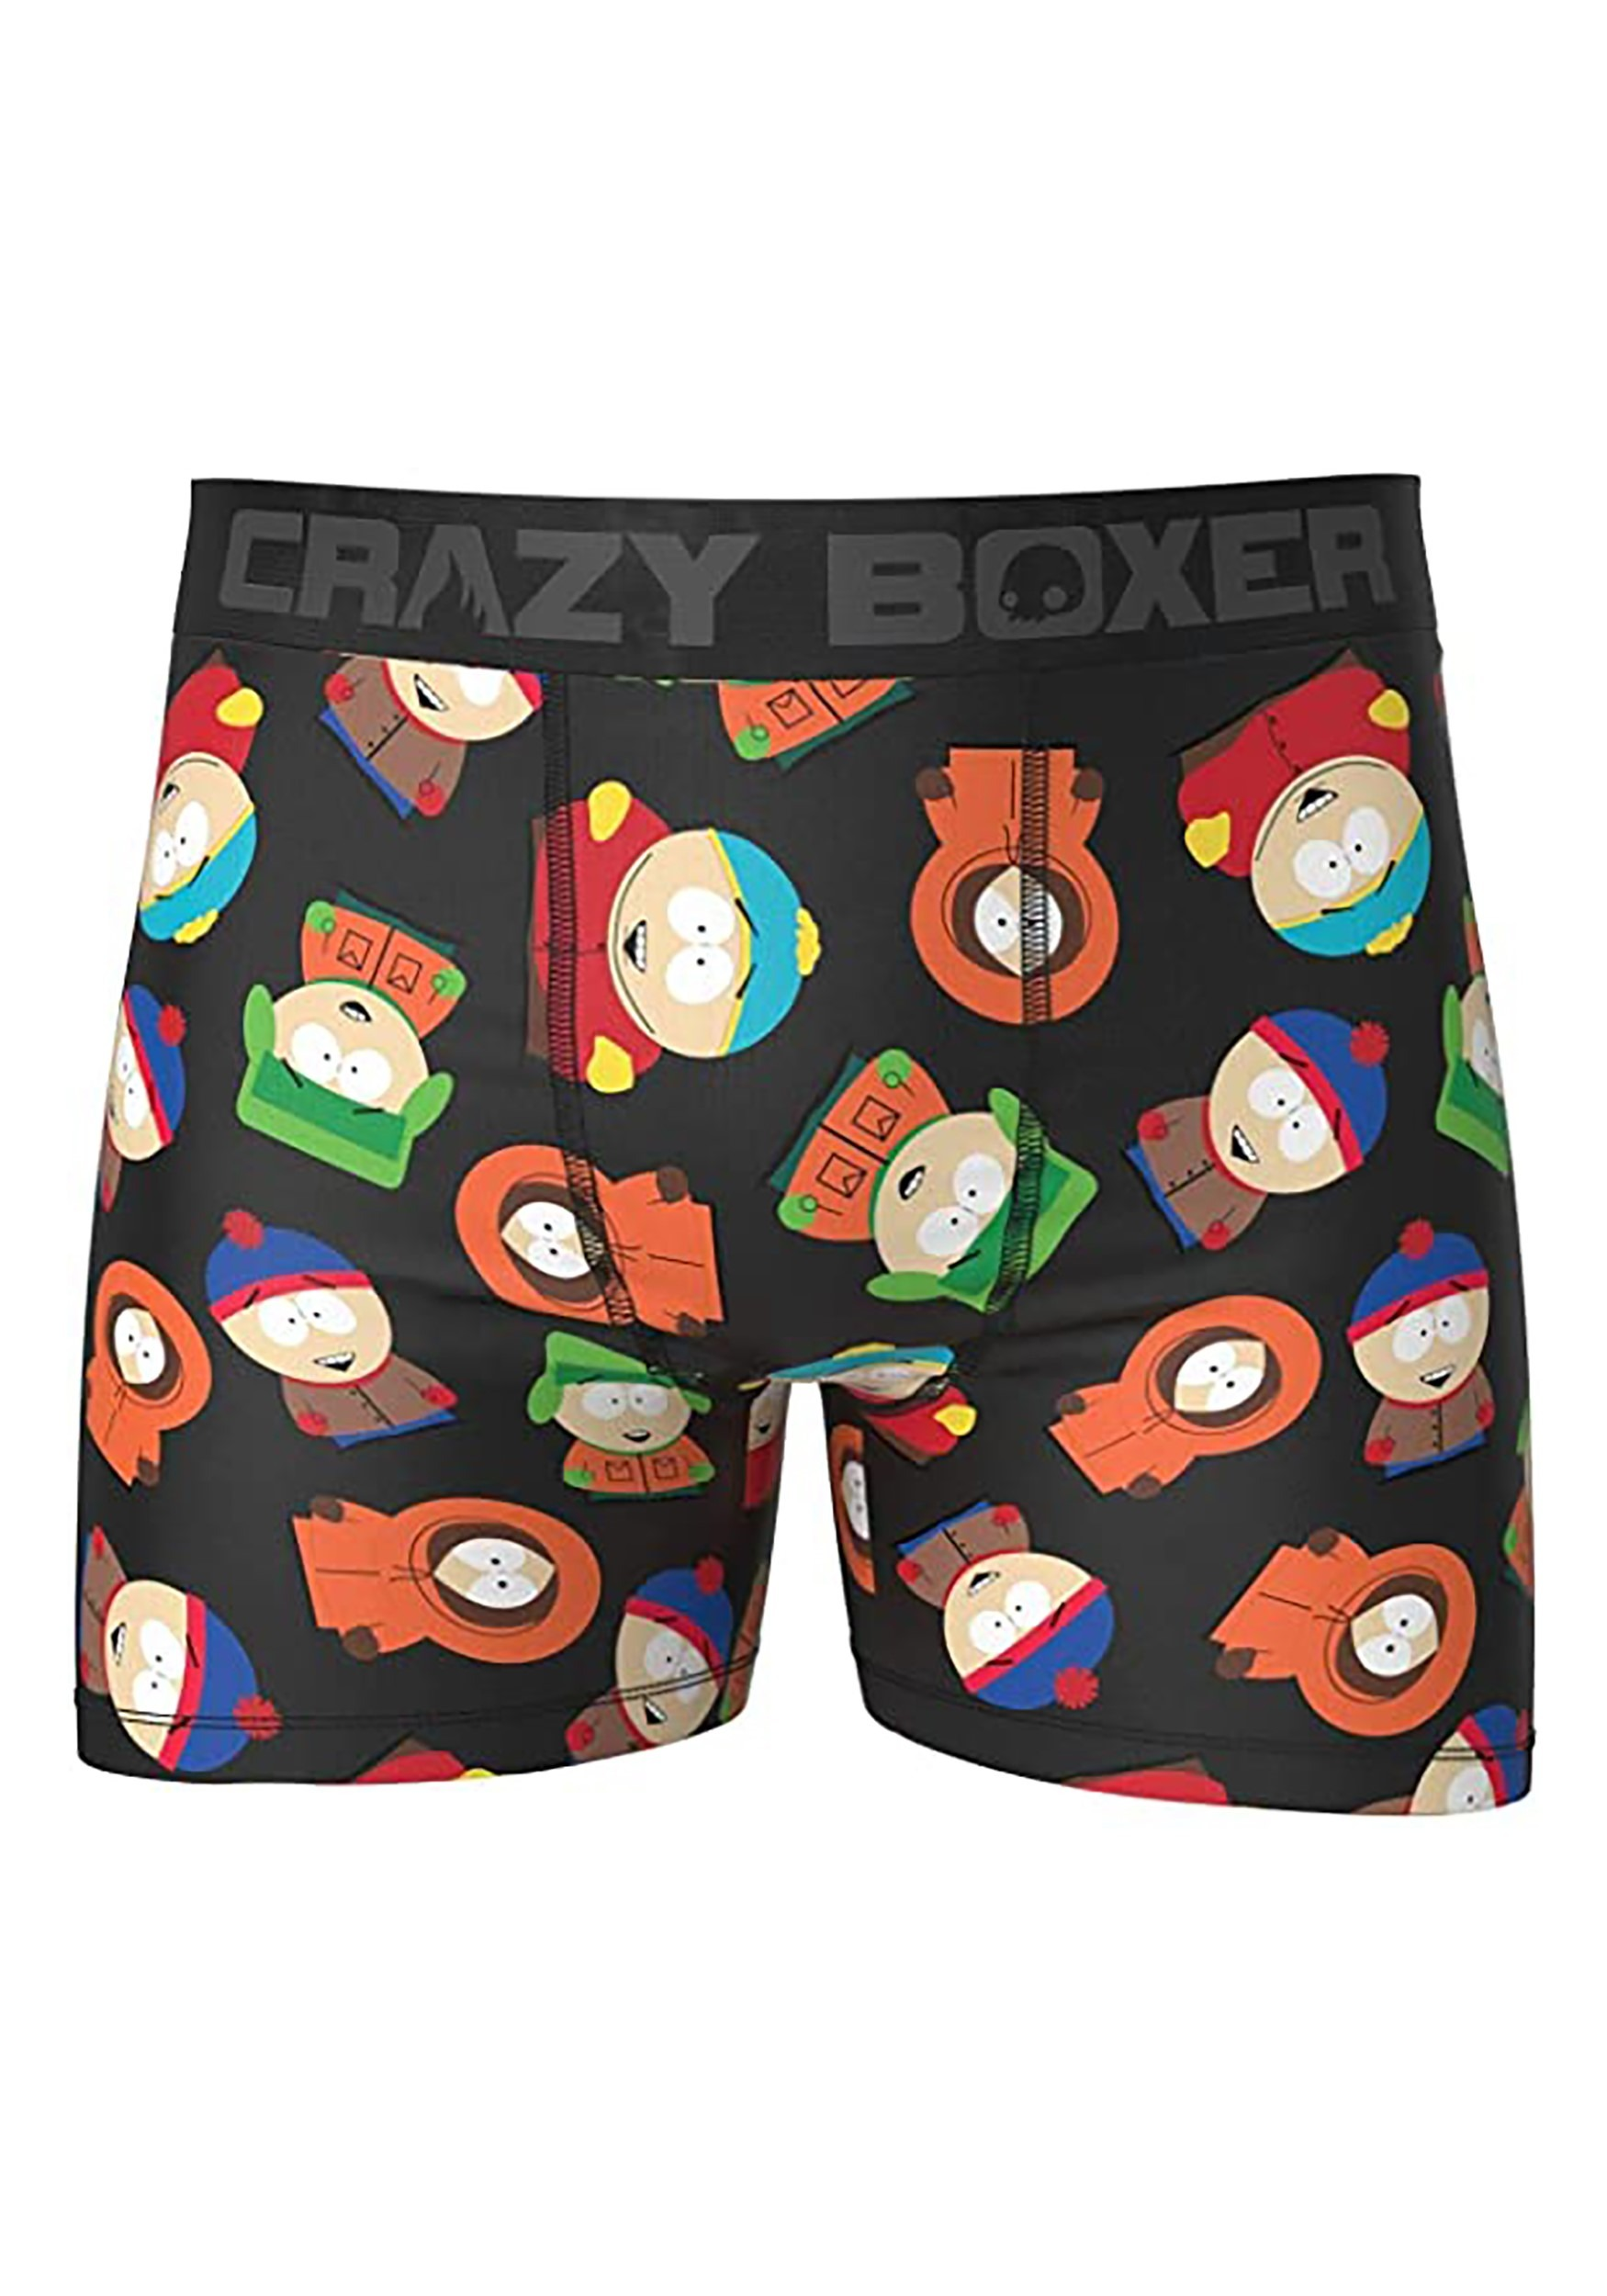 Crazy Boxer Boxer Brief Men Underwear South Park